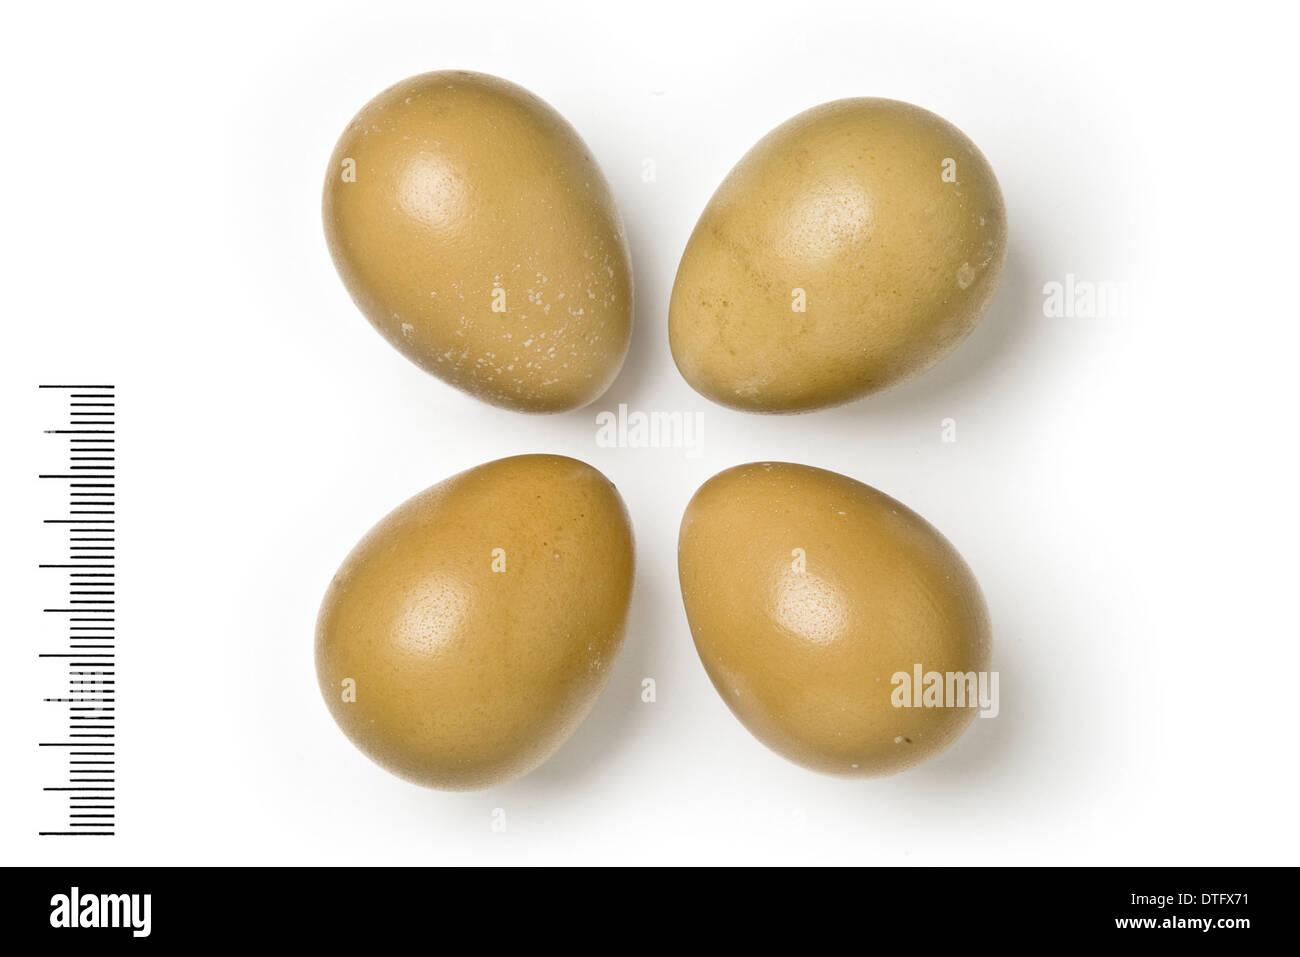 Francolinus francolinus, black francolin eggs - Stock Image